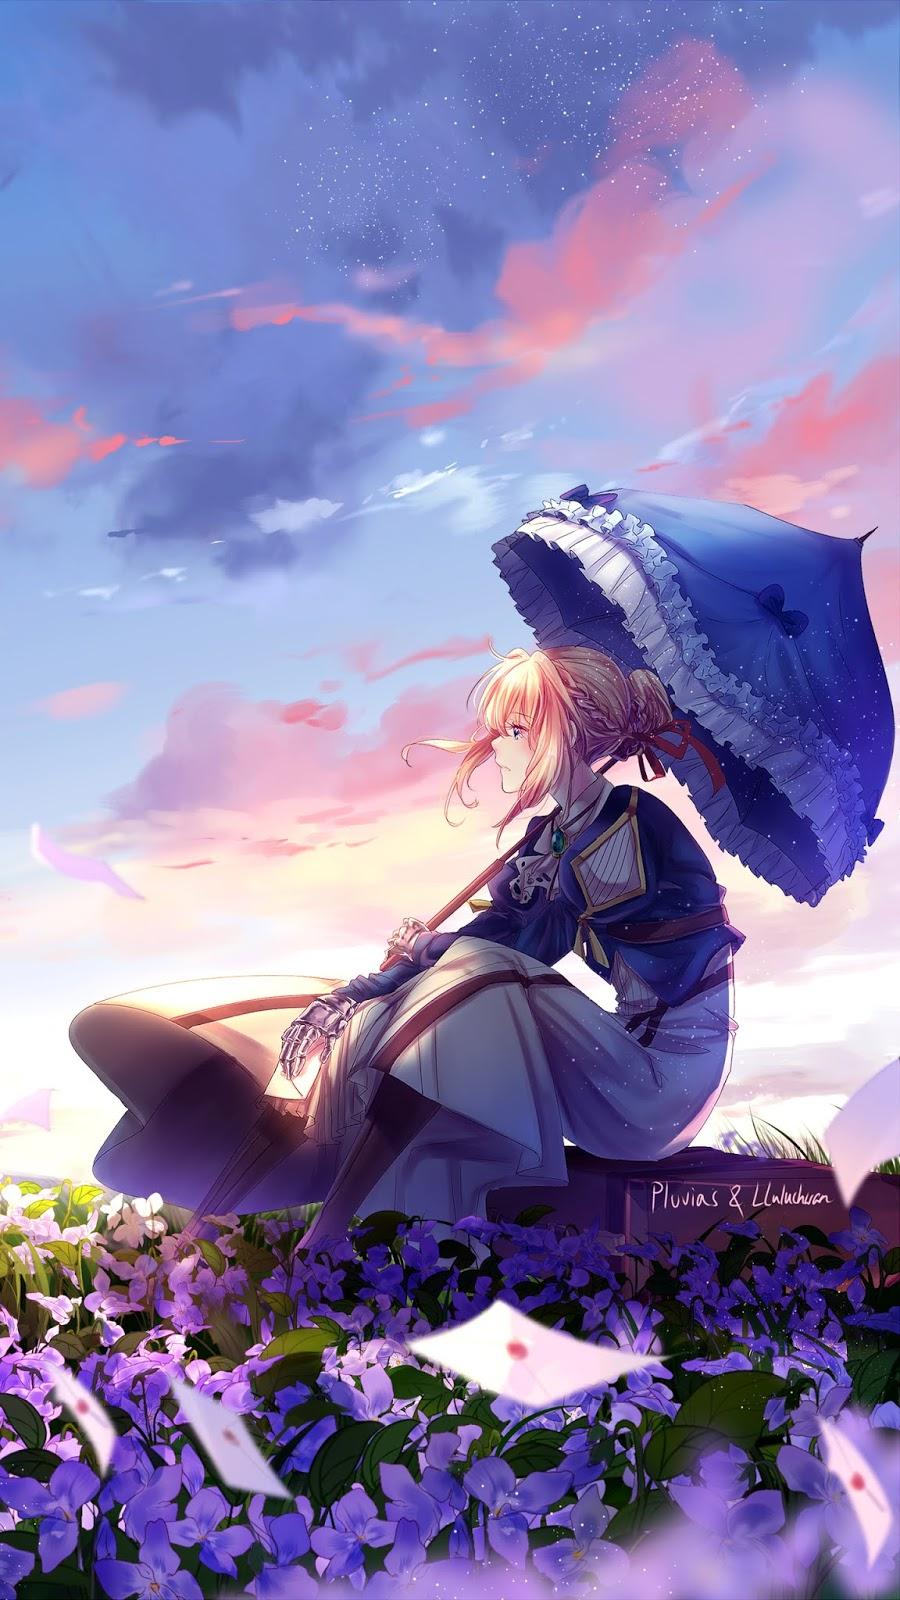 Sweet Magic: Wallpapers 4k para Celular: Animes e Artwoks